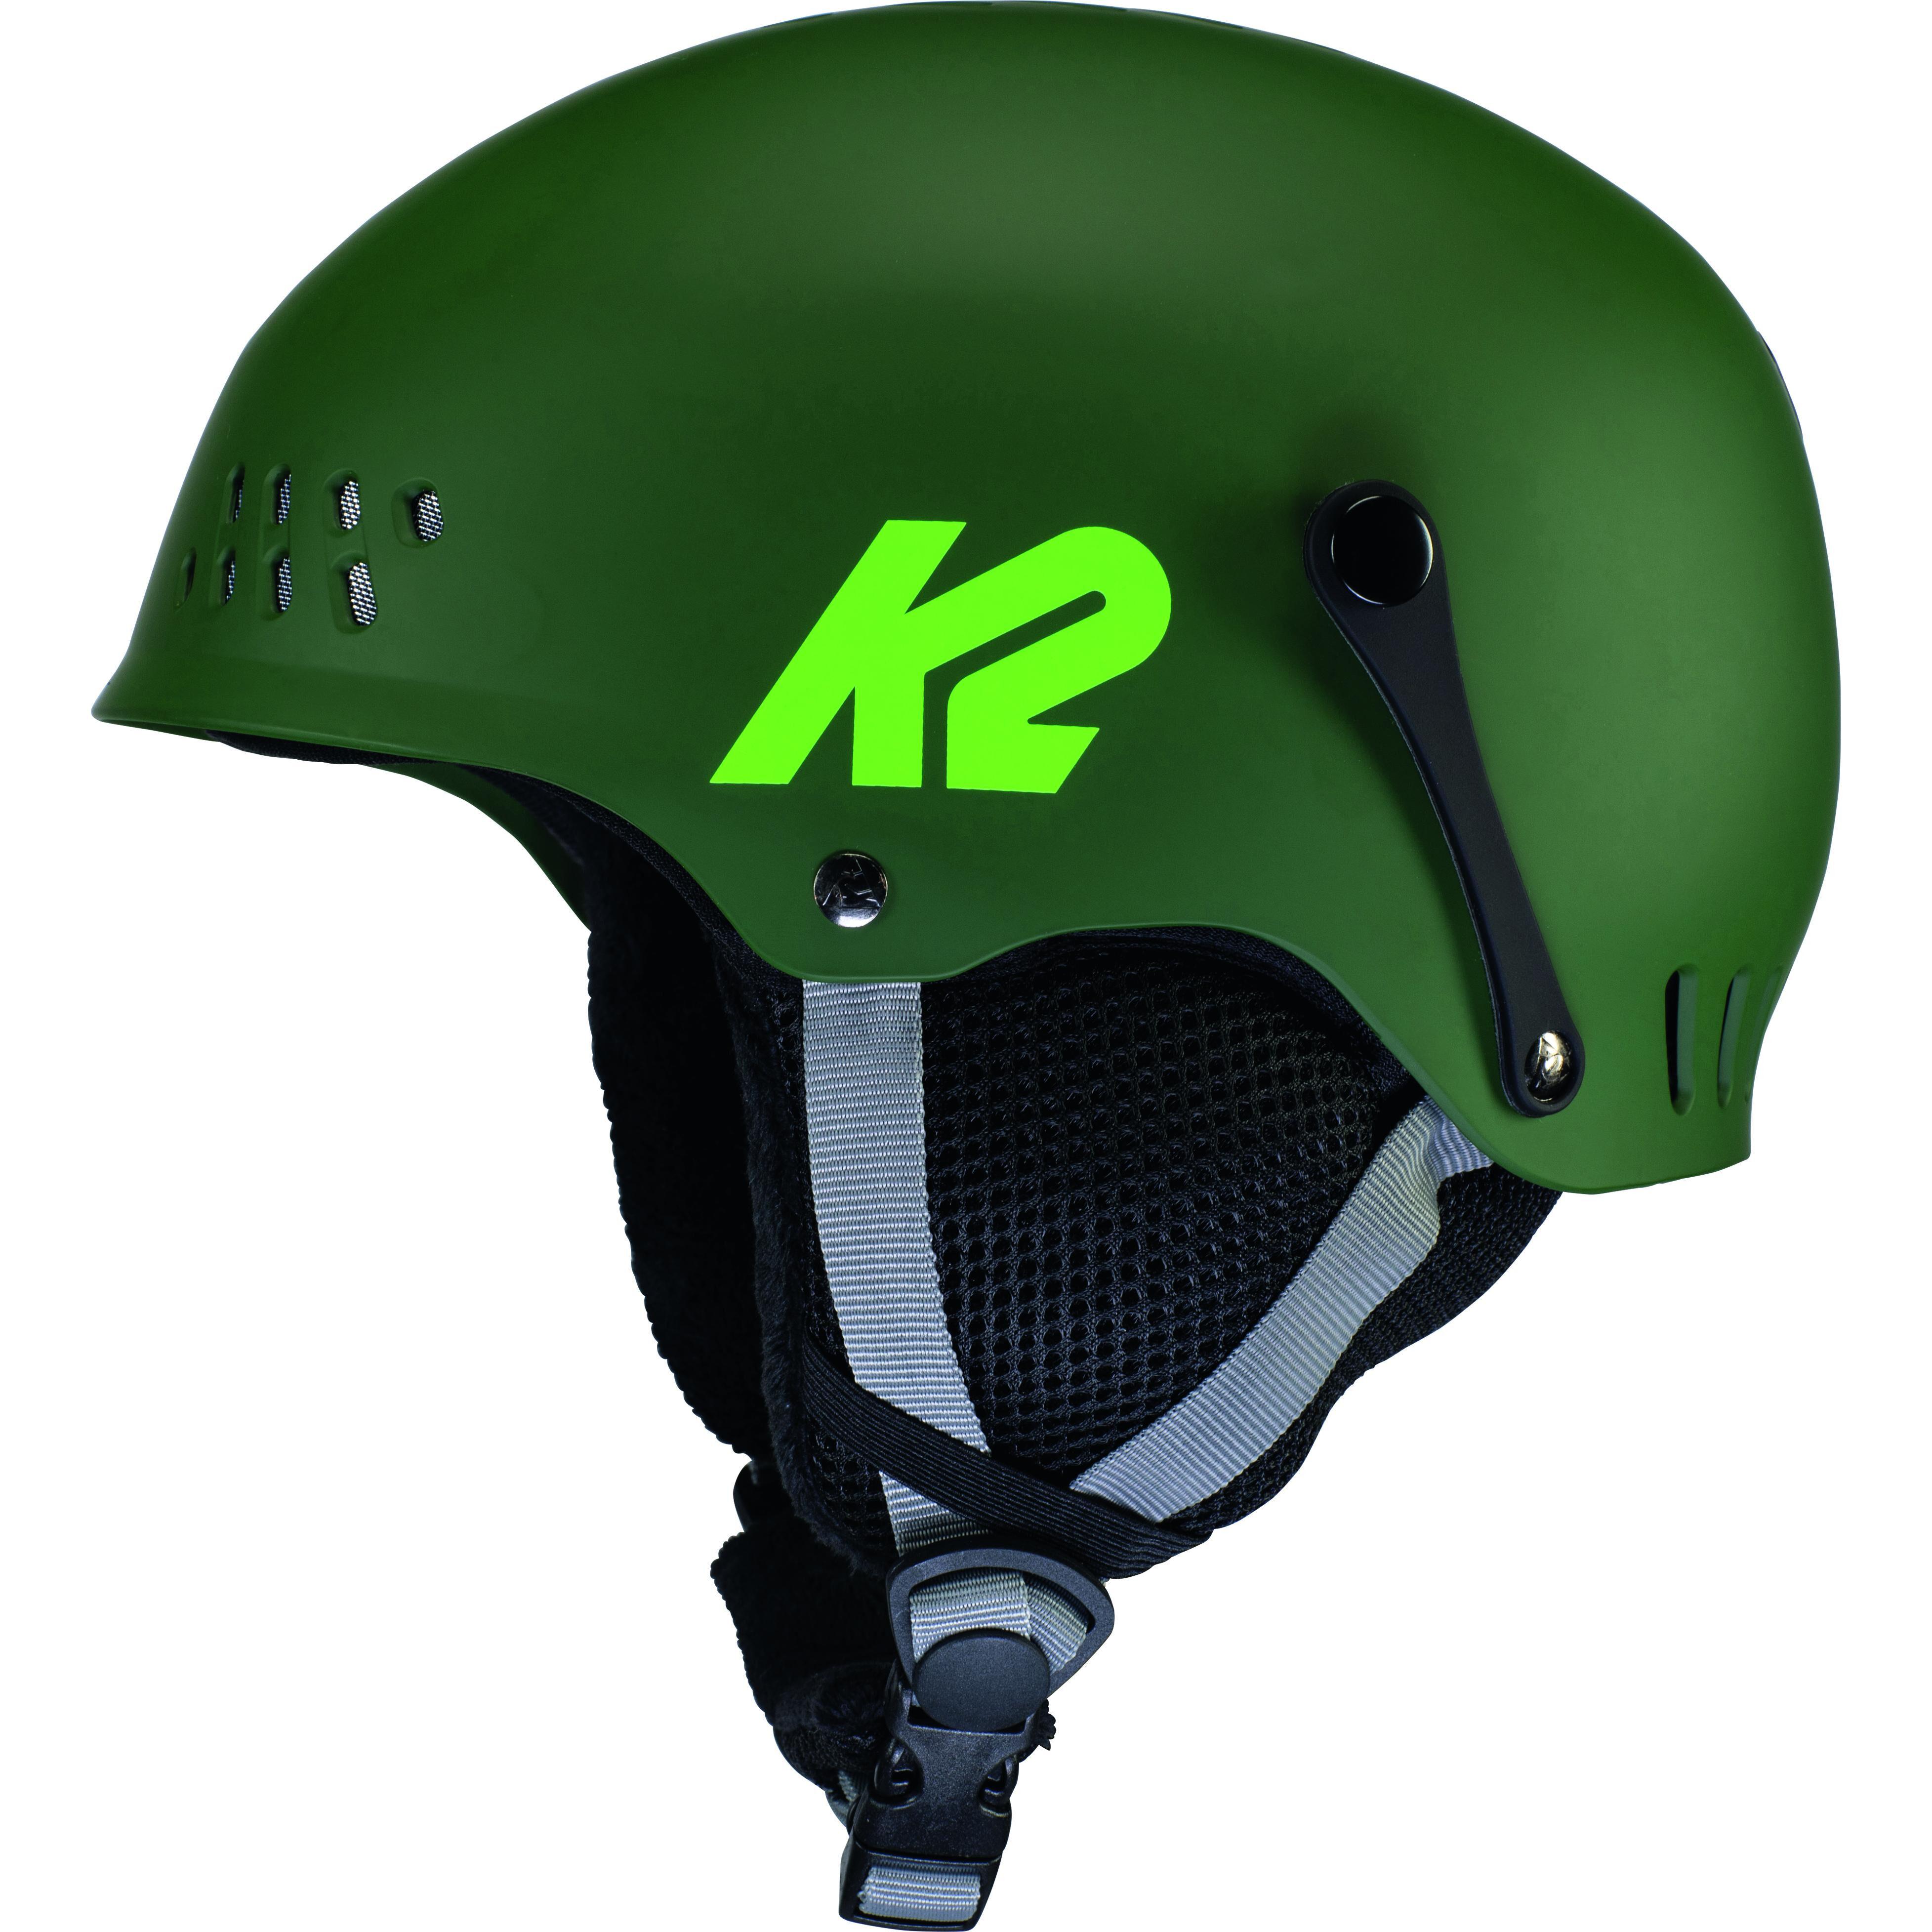 k2 Casque De Ski/snow K2 Entity Lizard Tail Garçon